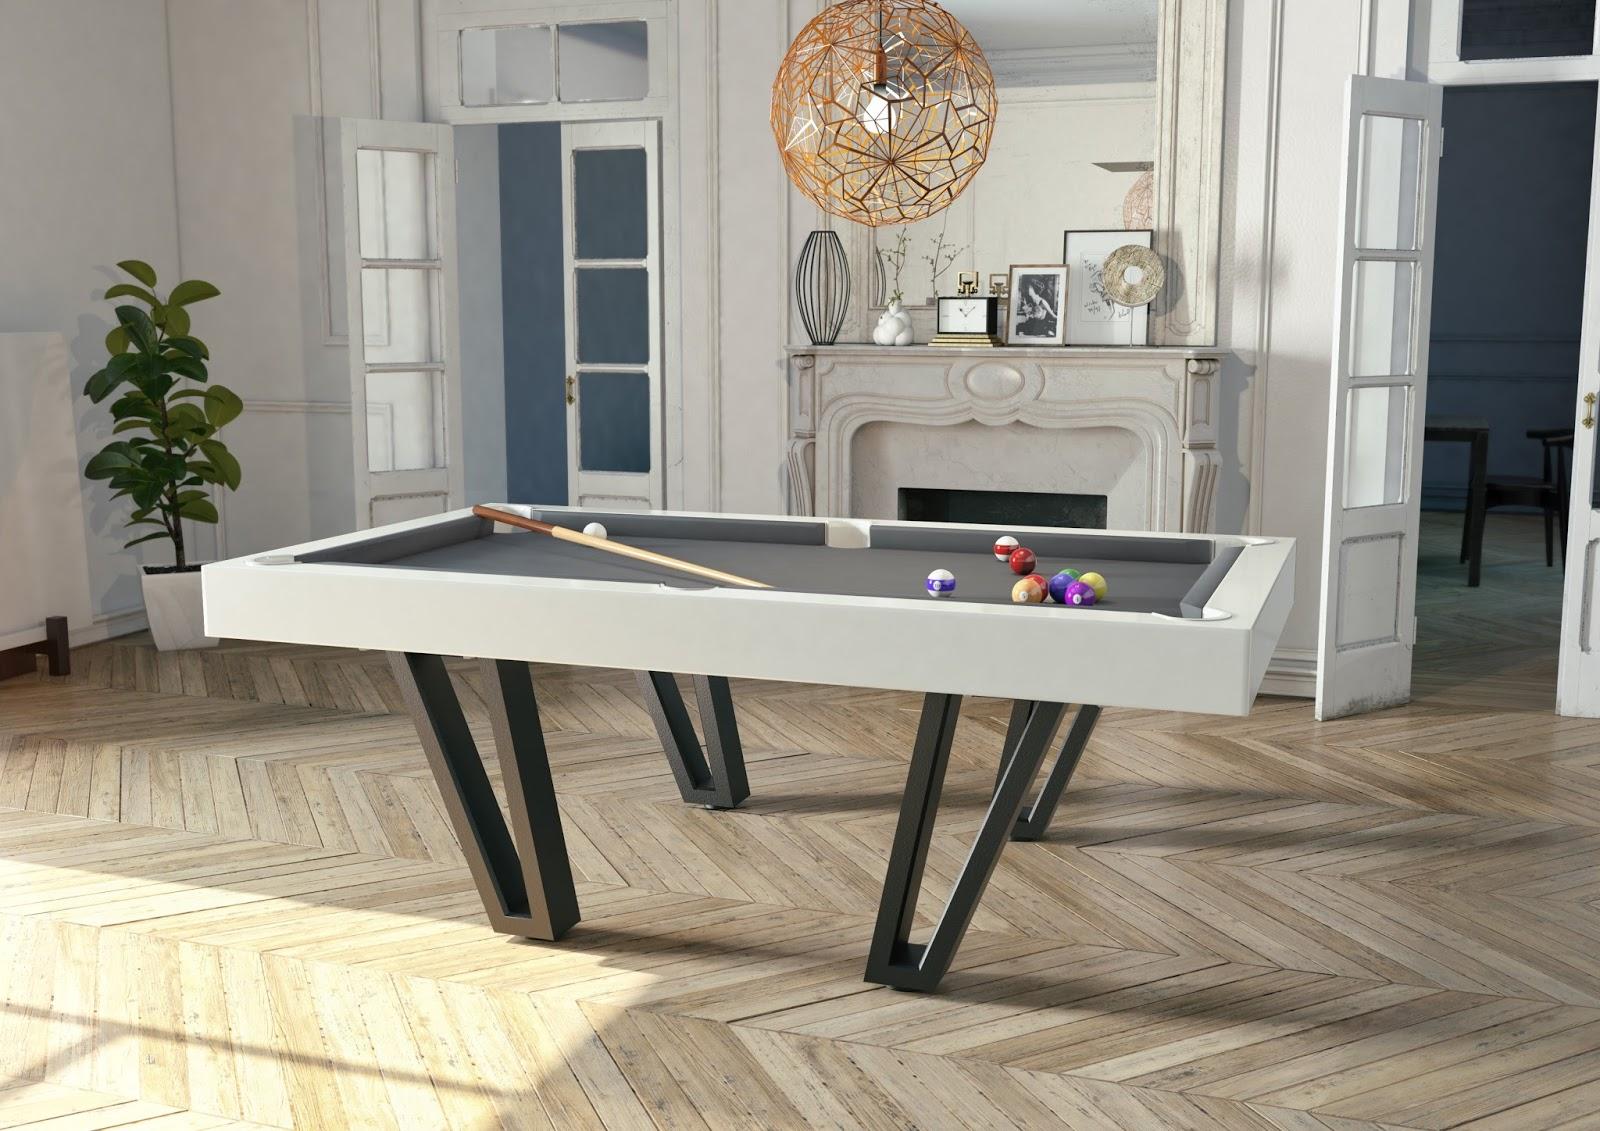 Fabricant de billards osmoz le nouveau billard table design de billards br ton - Billards bretonse ...